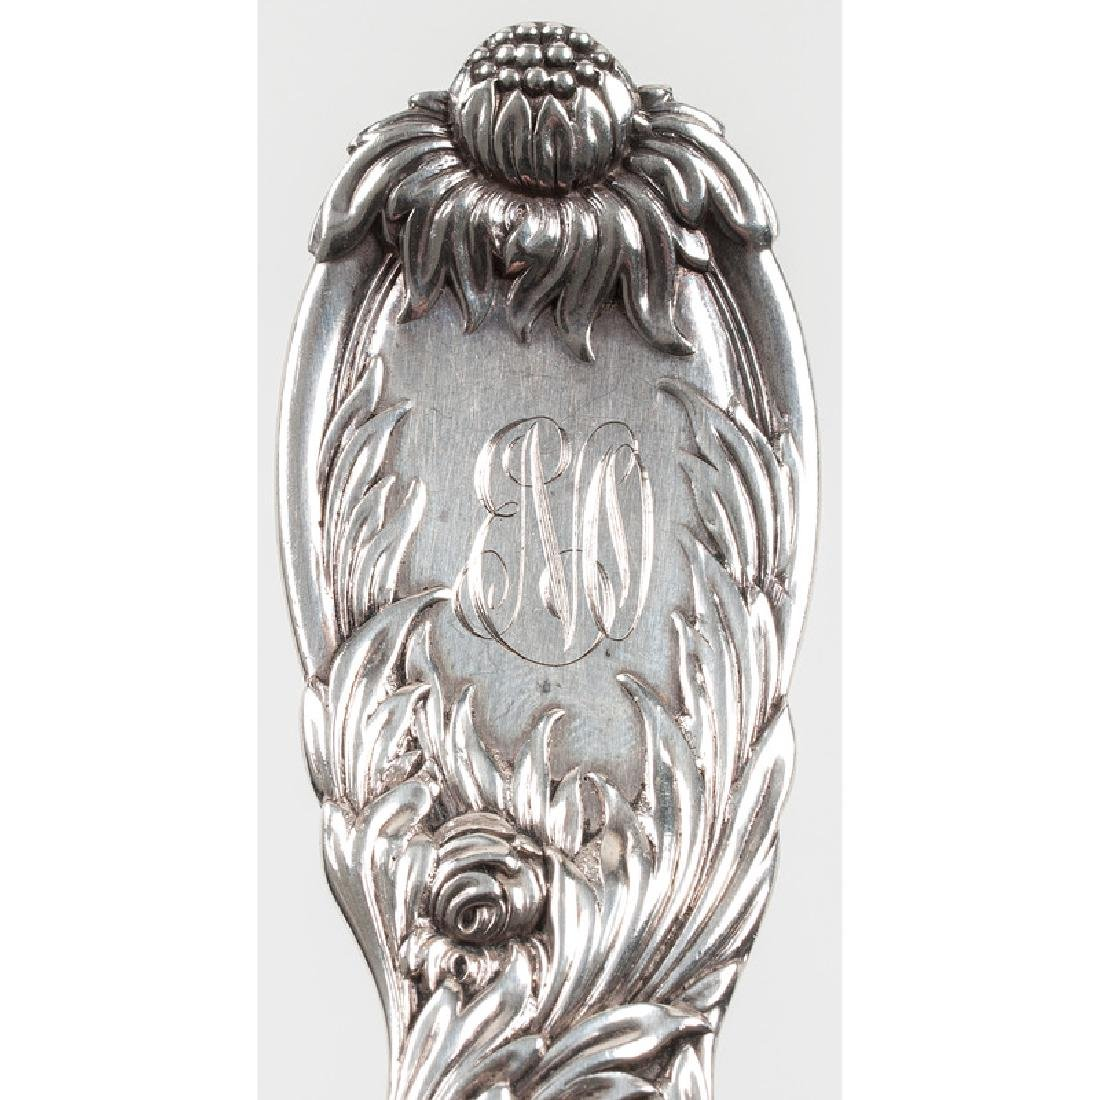 Tiffany & Co. Sterling Chrysanthemum Serving Spoon - 4